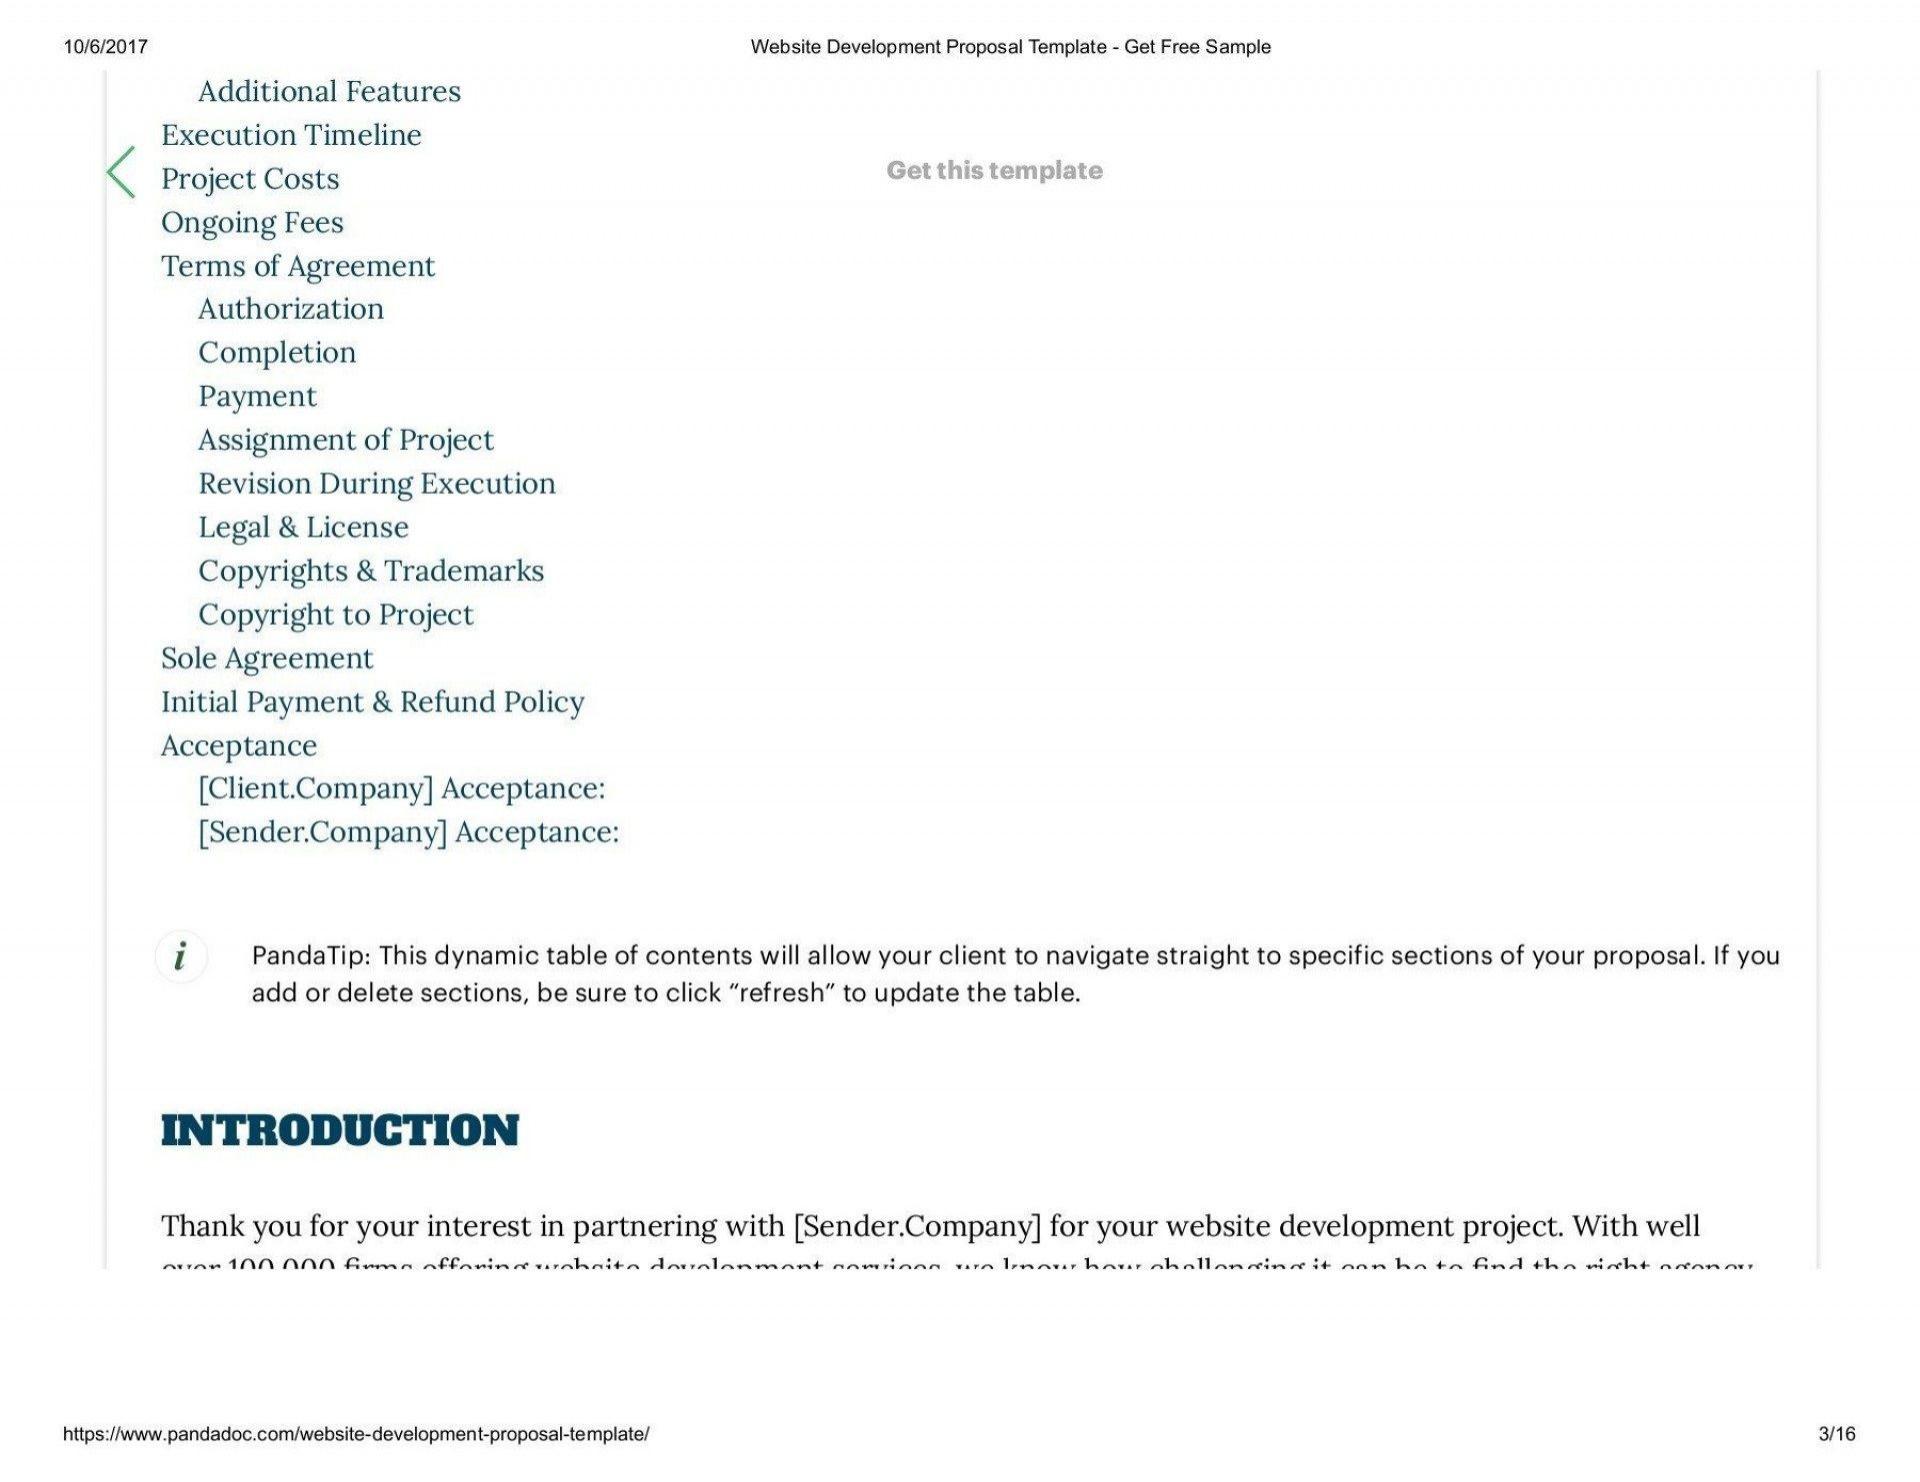 008 Outstanding Website Development Proposal Template Free Concept  Word1920